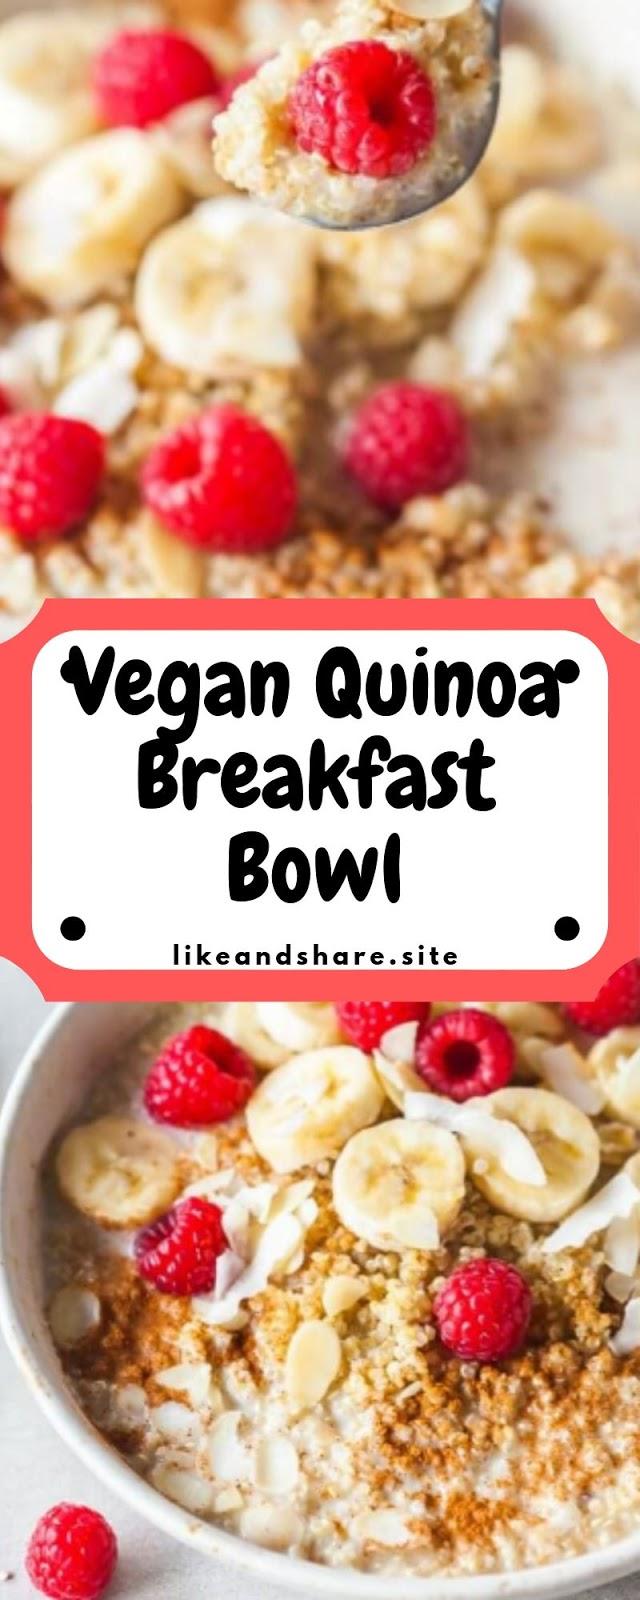 Vegan Quinoa Breakfast Bowl